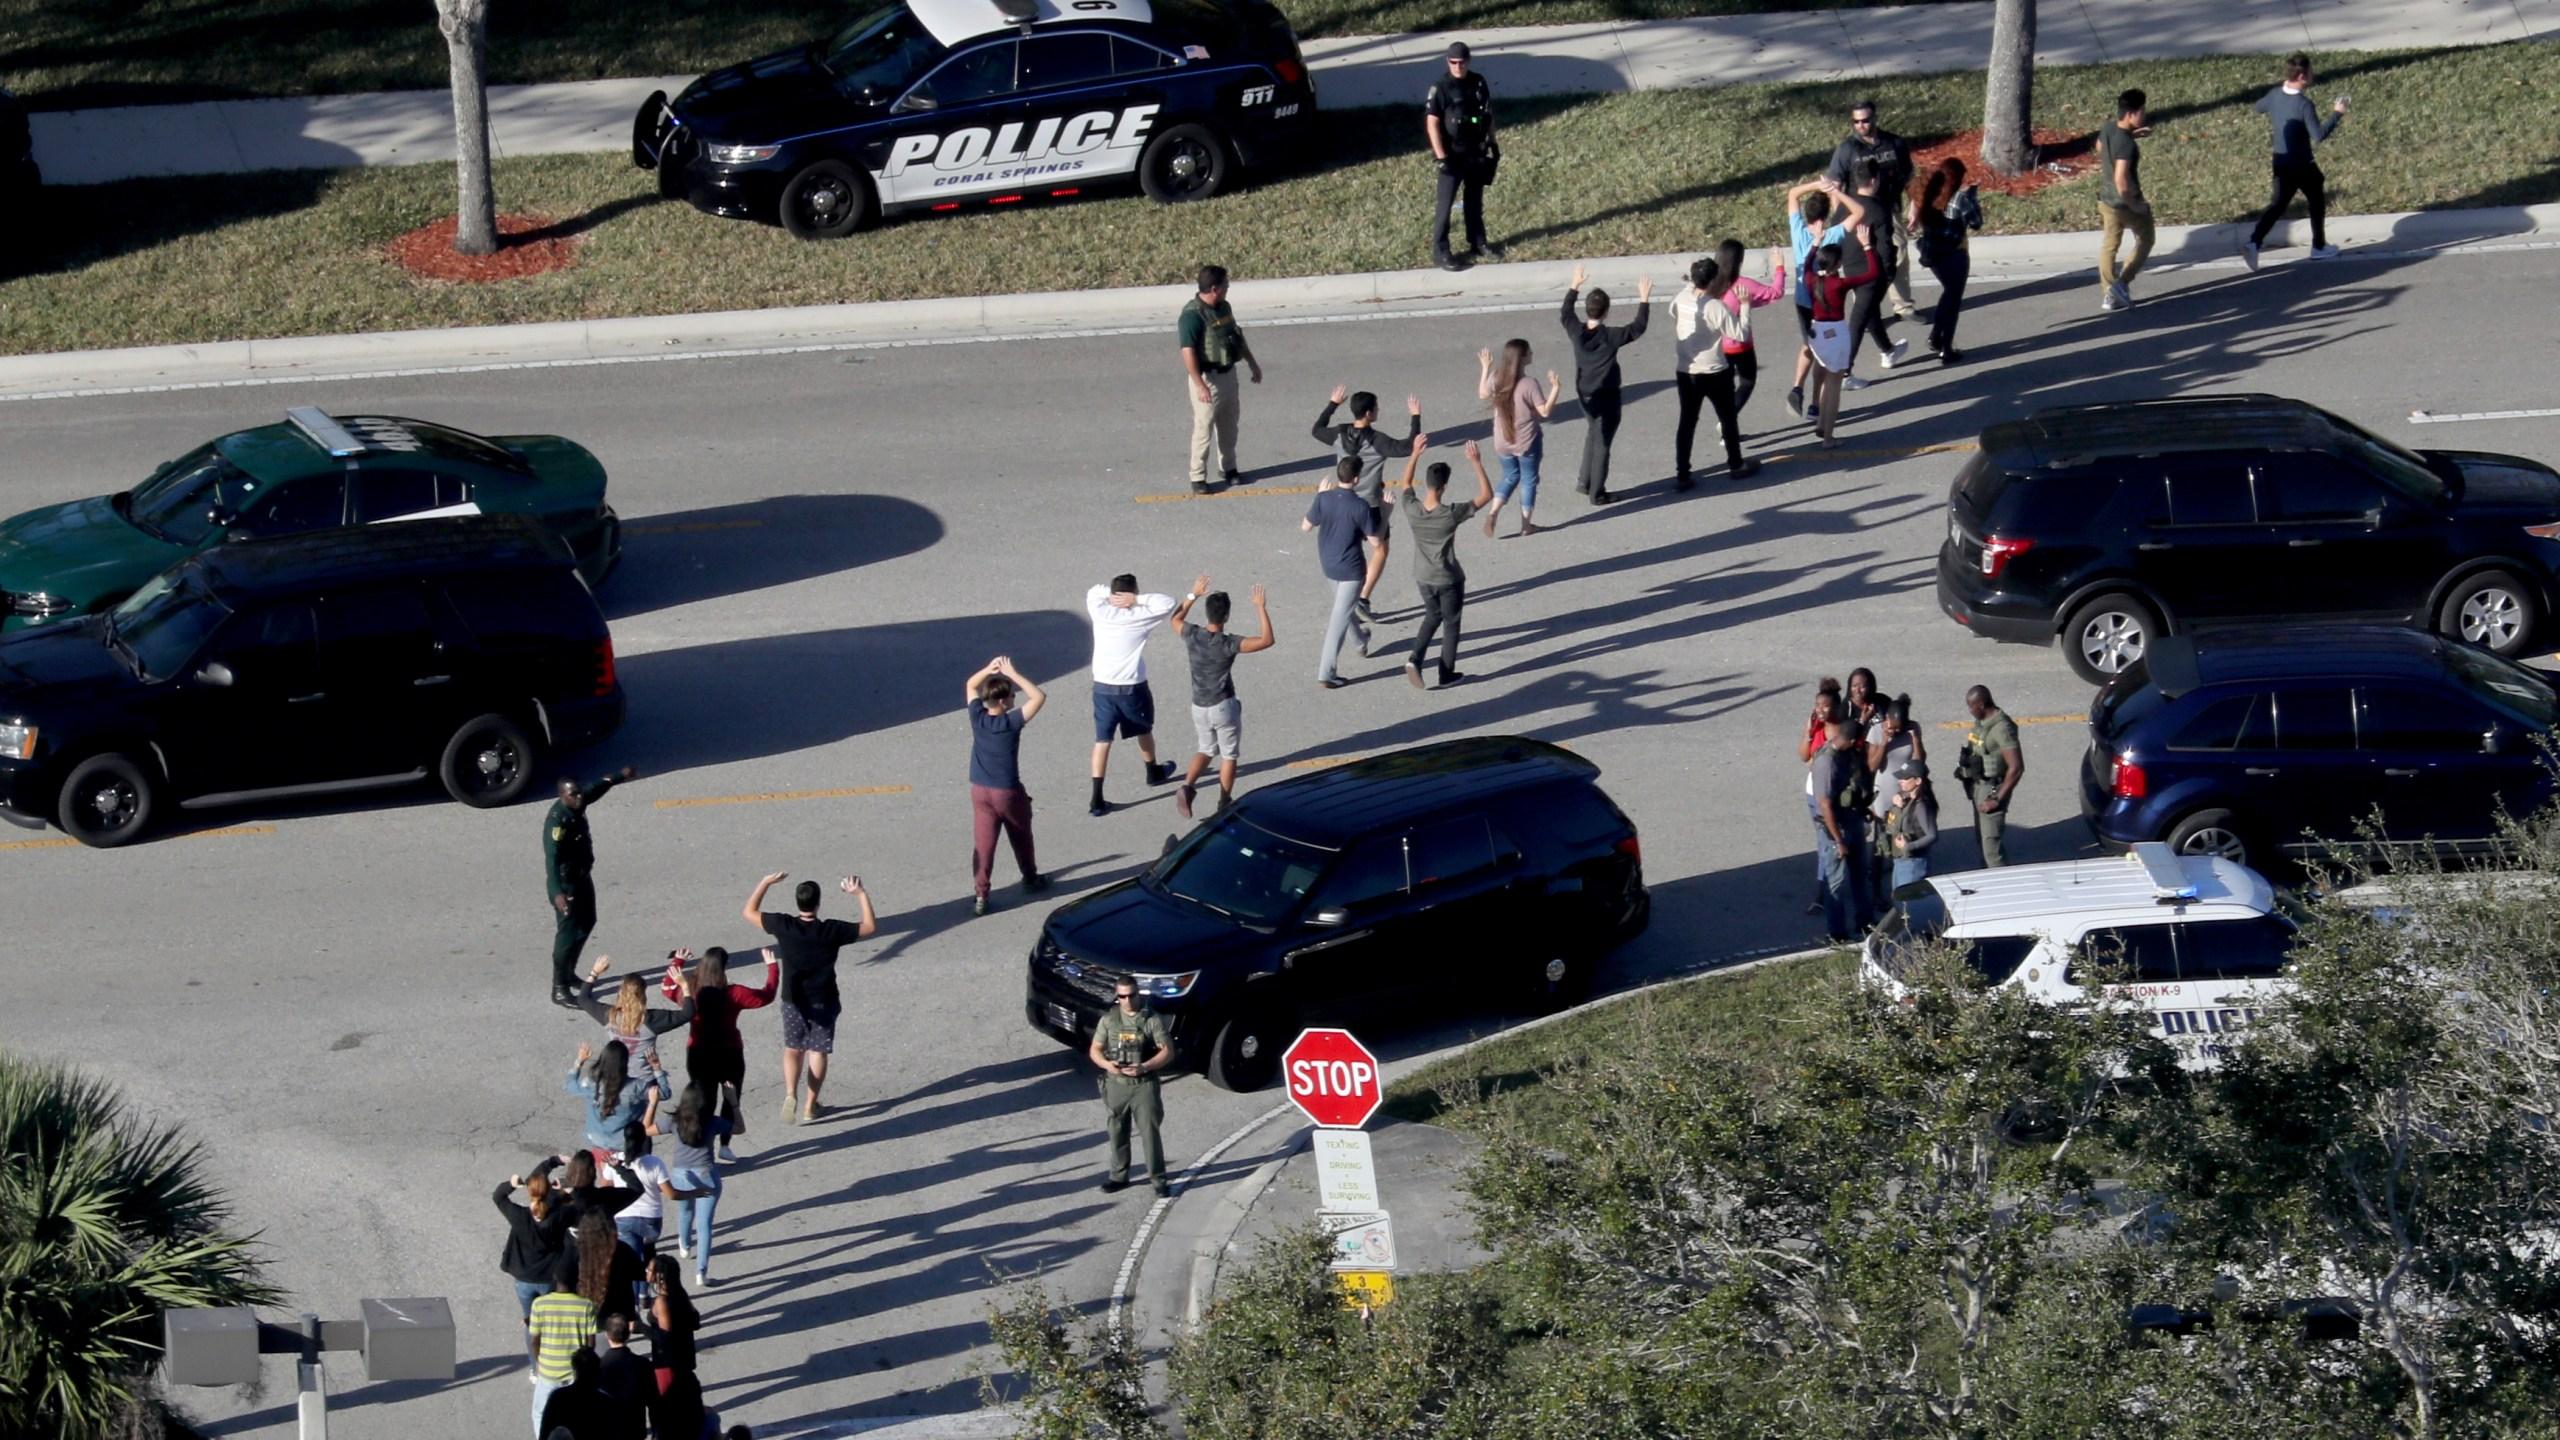 Florida_School_Shooting_911_Calls_05053-159532.jpg02708348